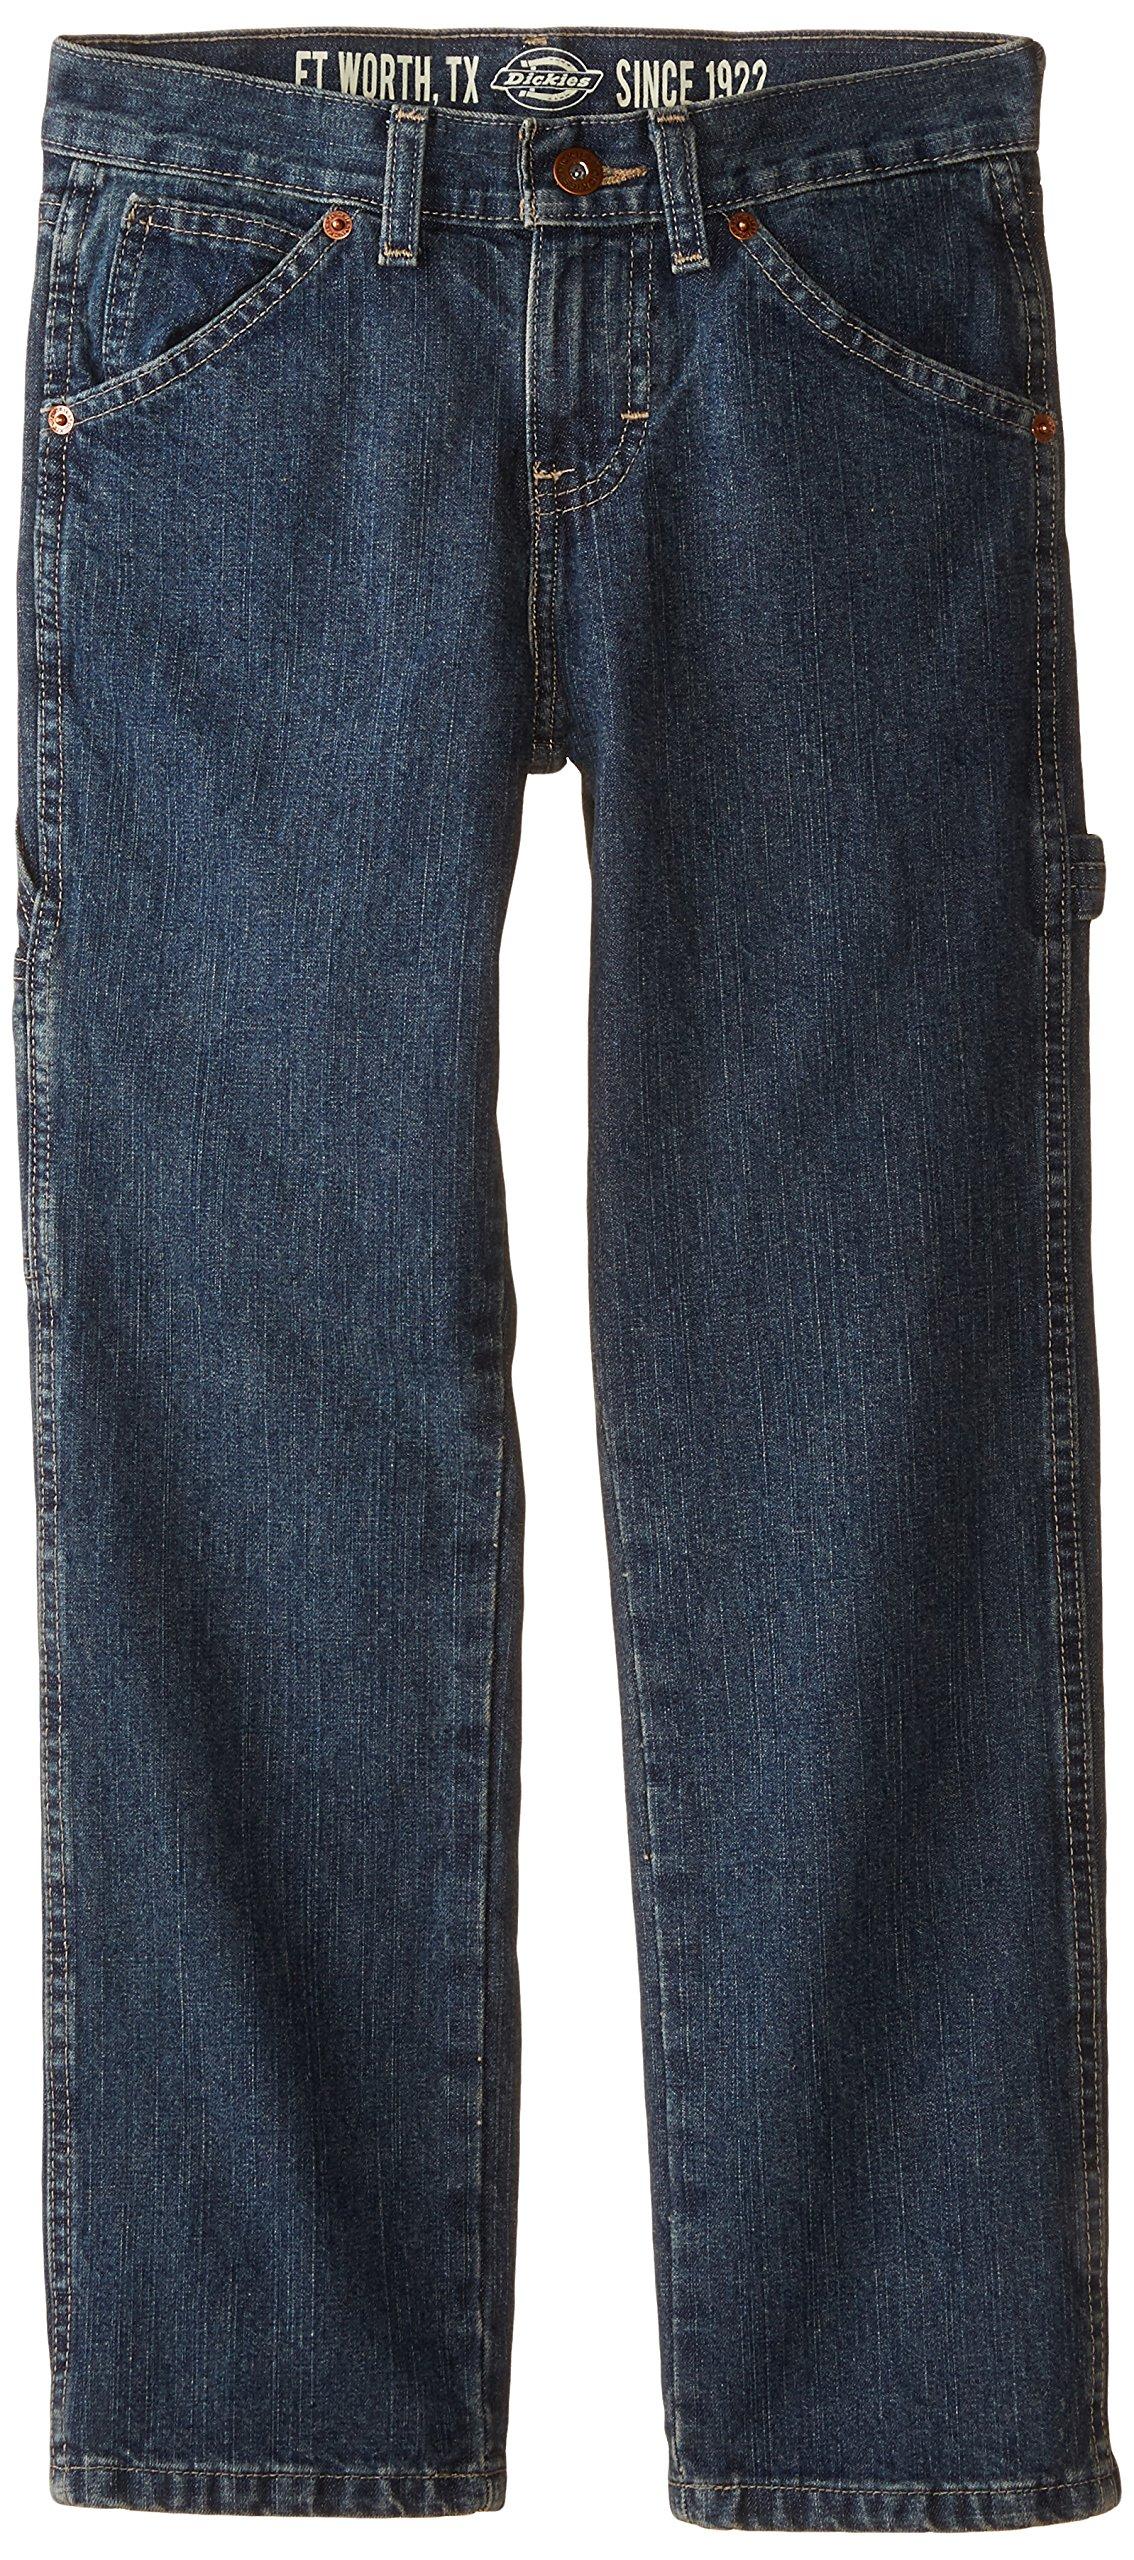 Dickies Big Boys' Denim Carpenter Jeans, Khaki Tint, 8